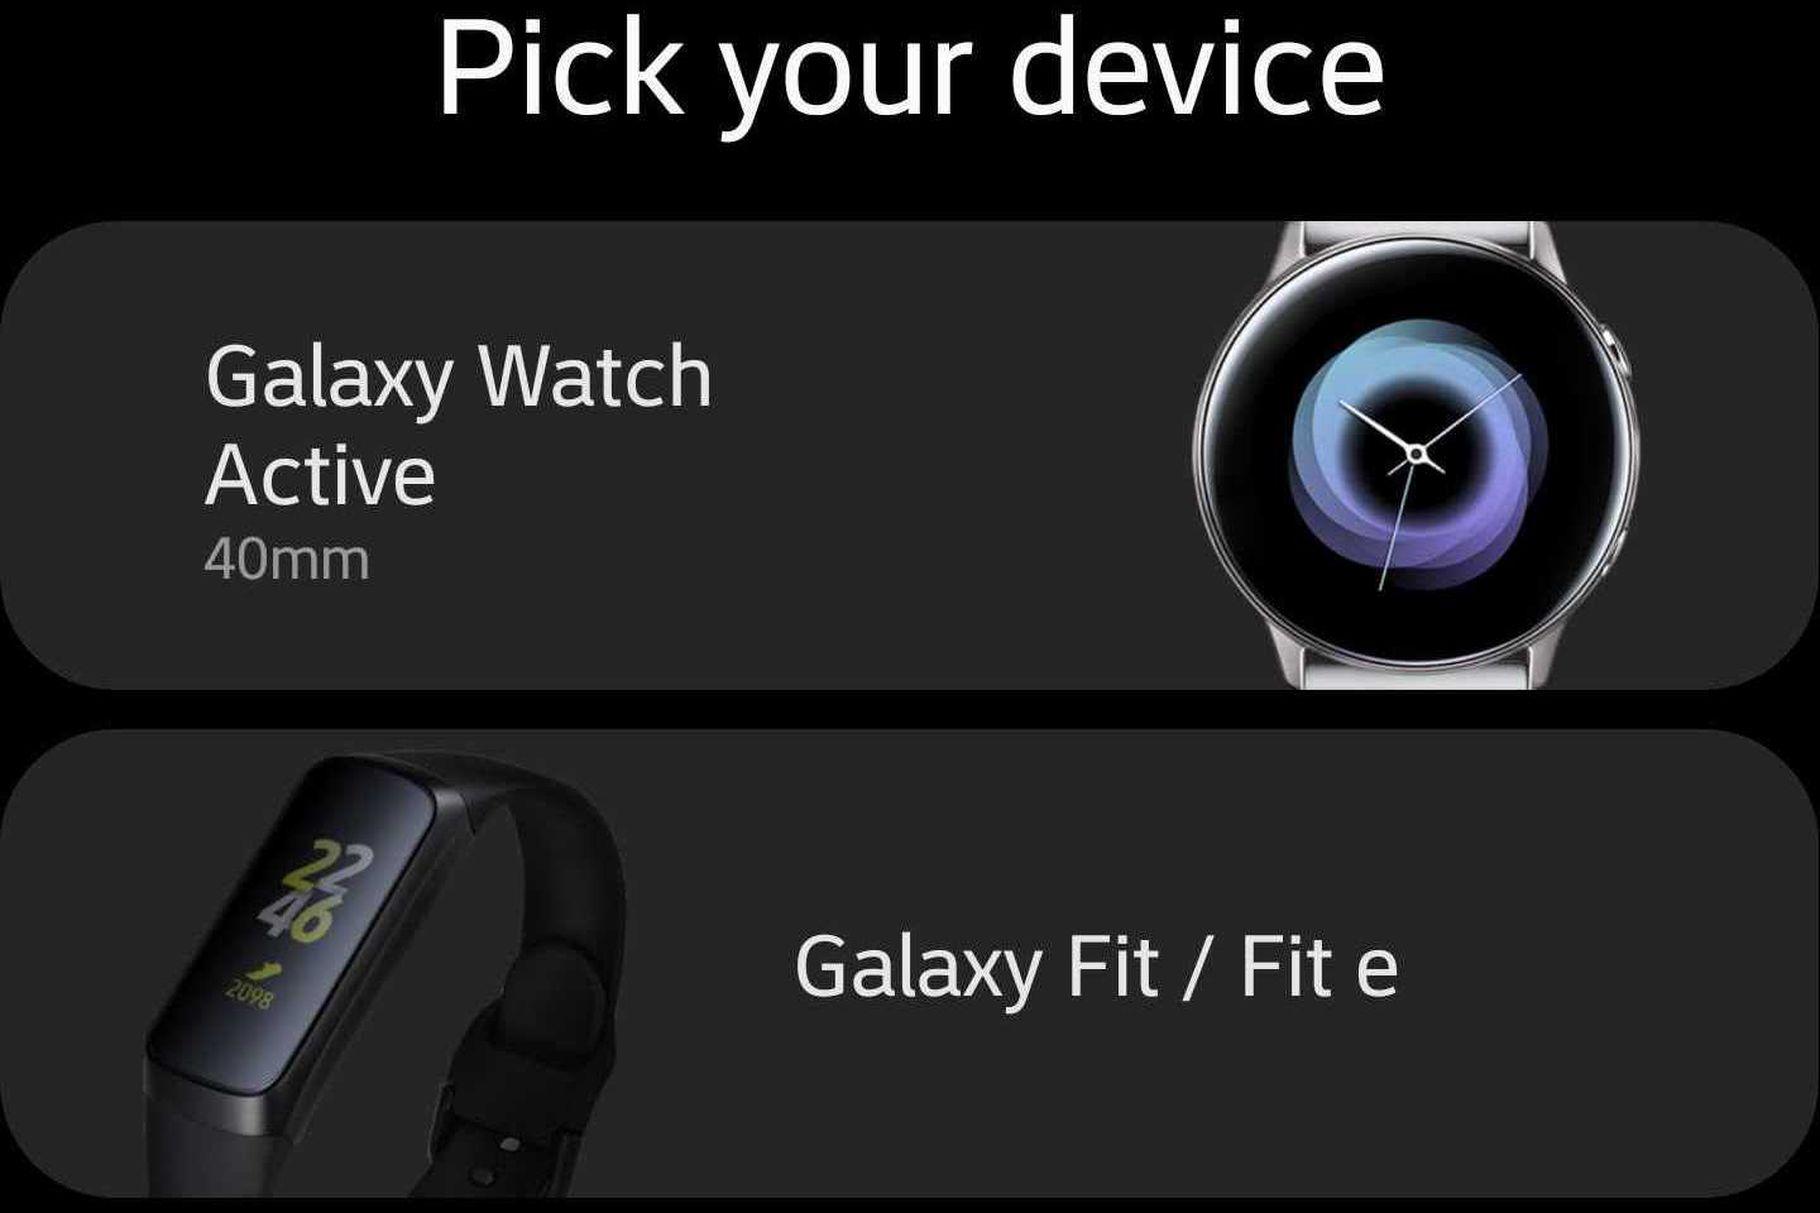 Samsung neuhlídal podobu hodinek, fitness náramku a sluchátek